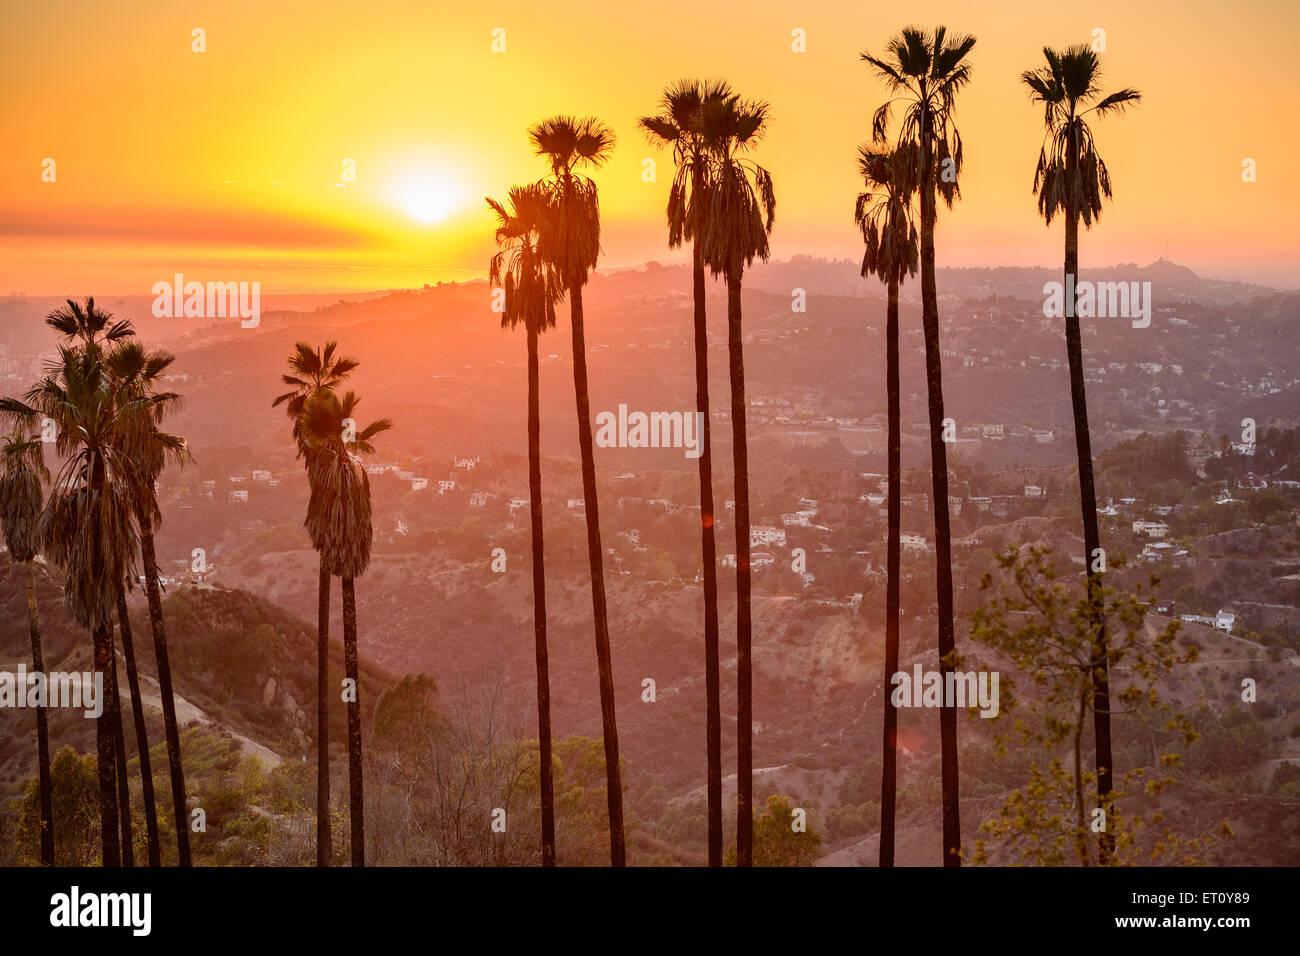 Griffith Park, Los Angeles, Kalifornien, USA. Stockbild